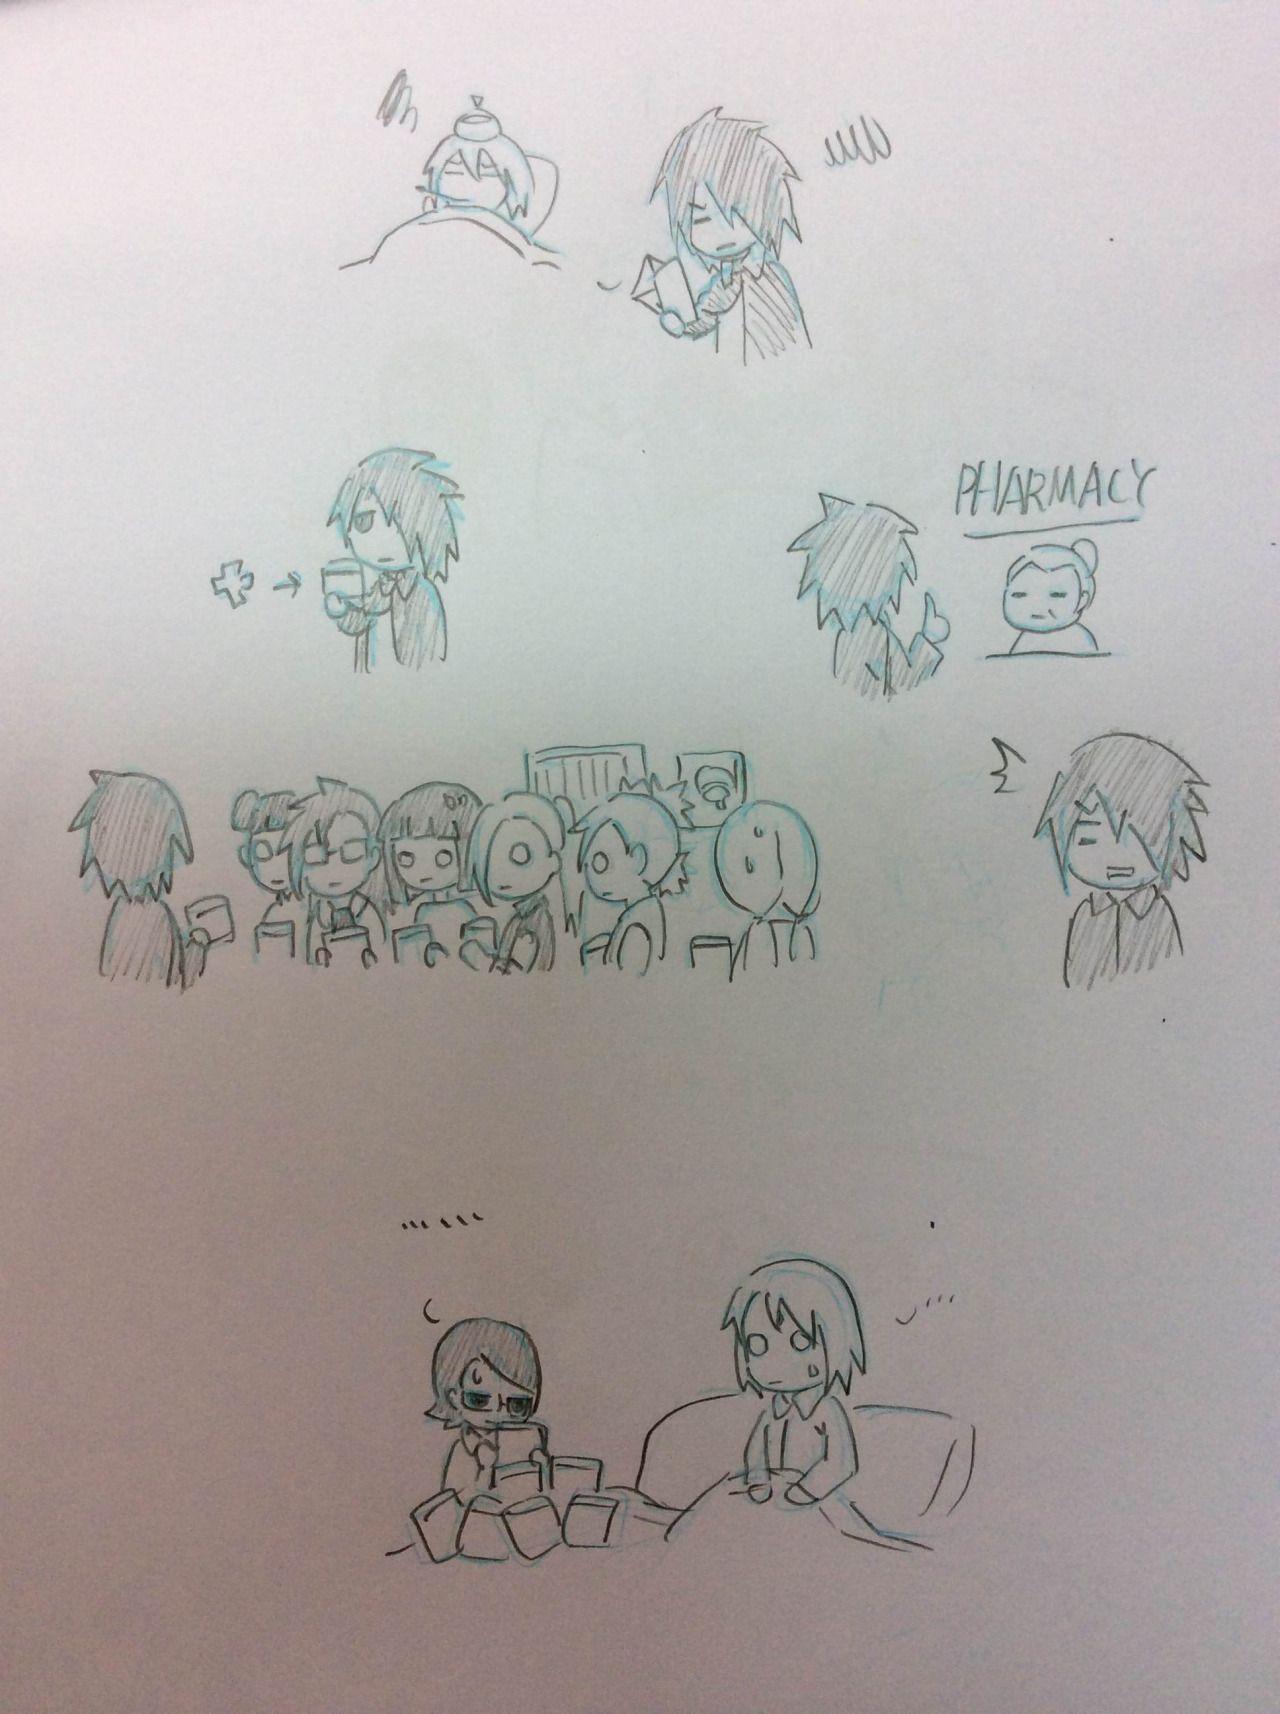 Synthia — Hiii, I really love SasuSaku and I wondered if you...